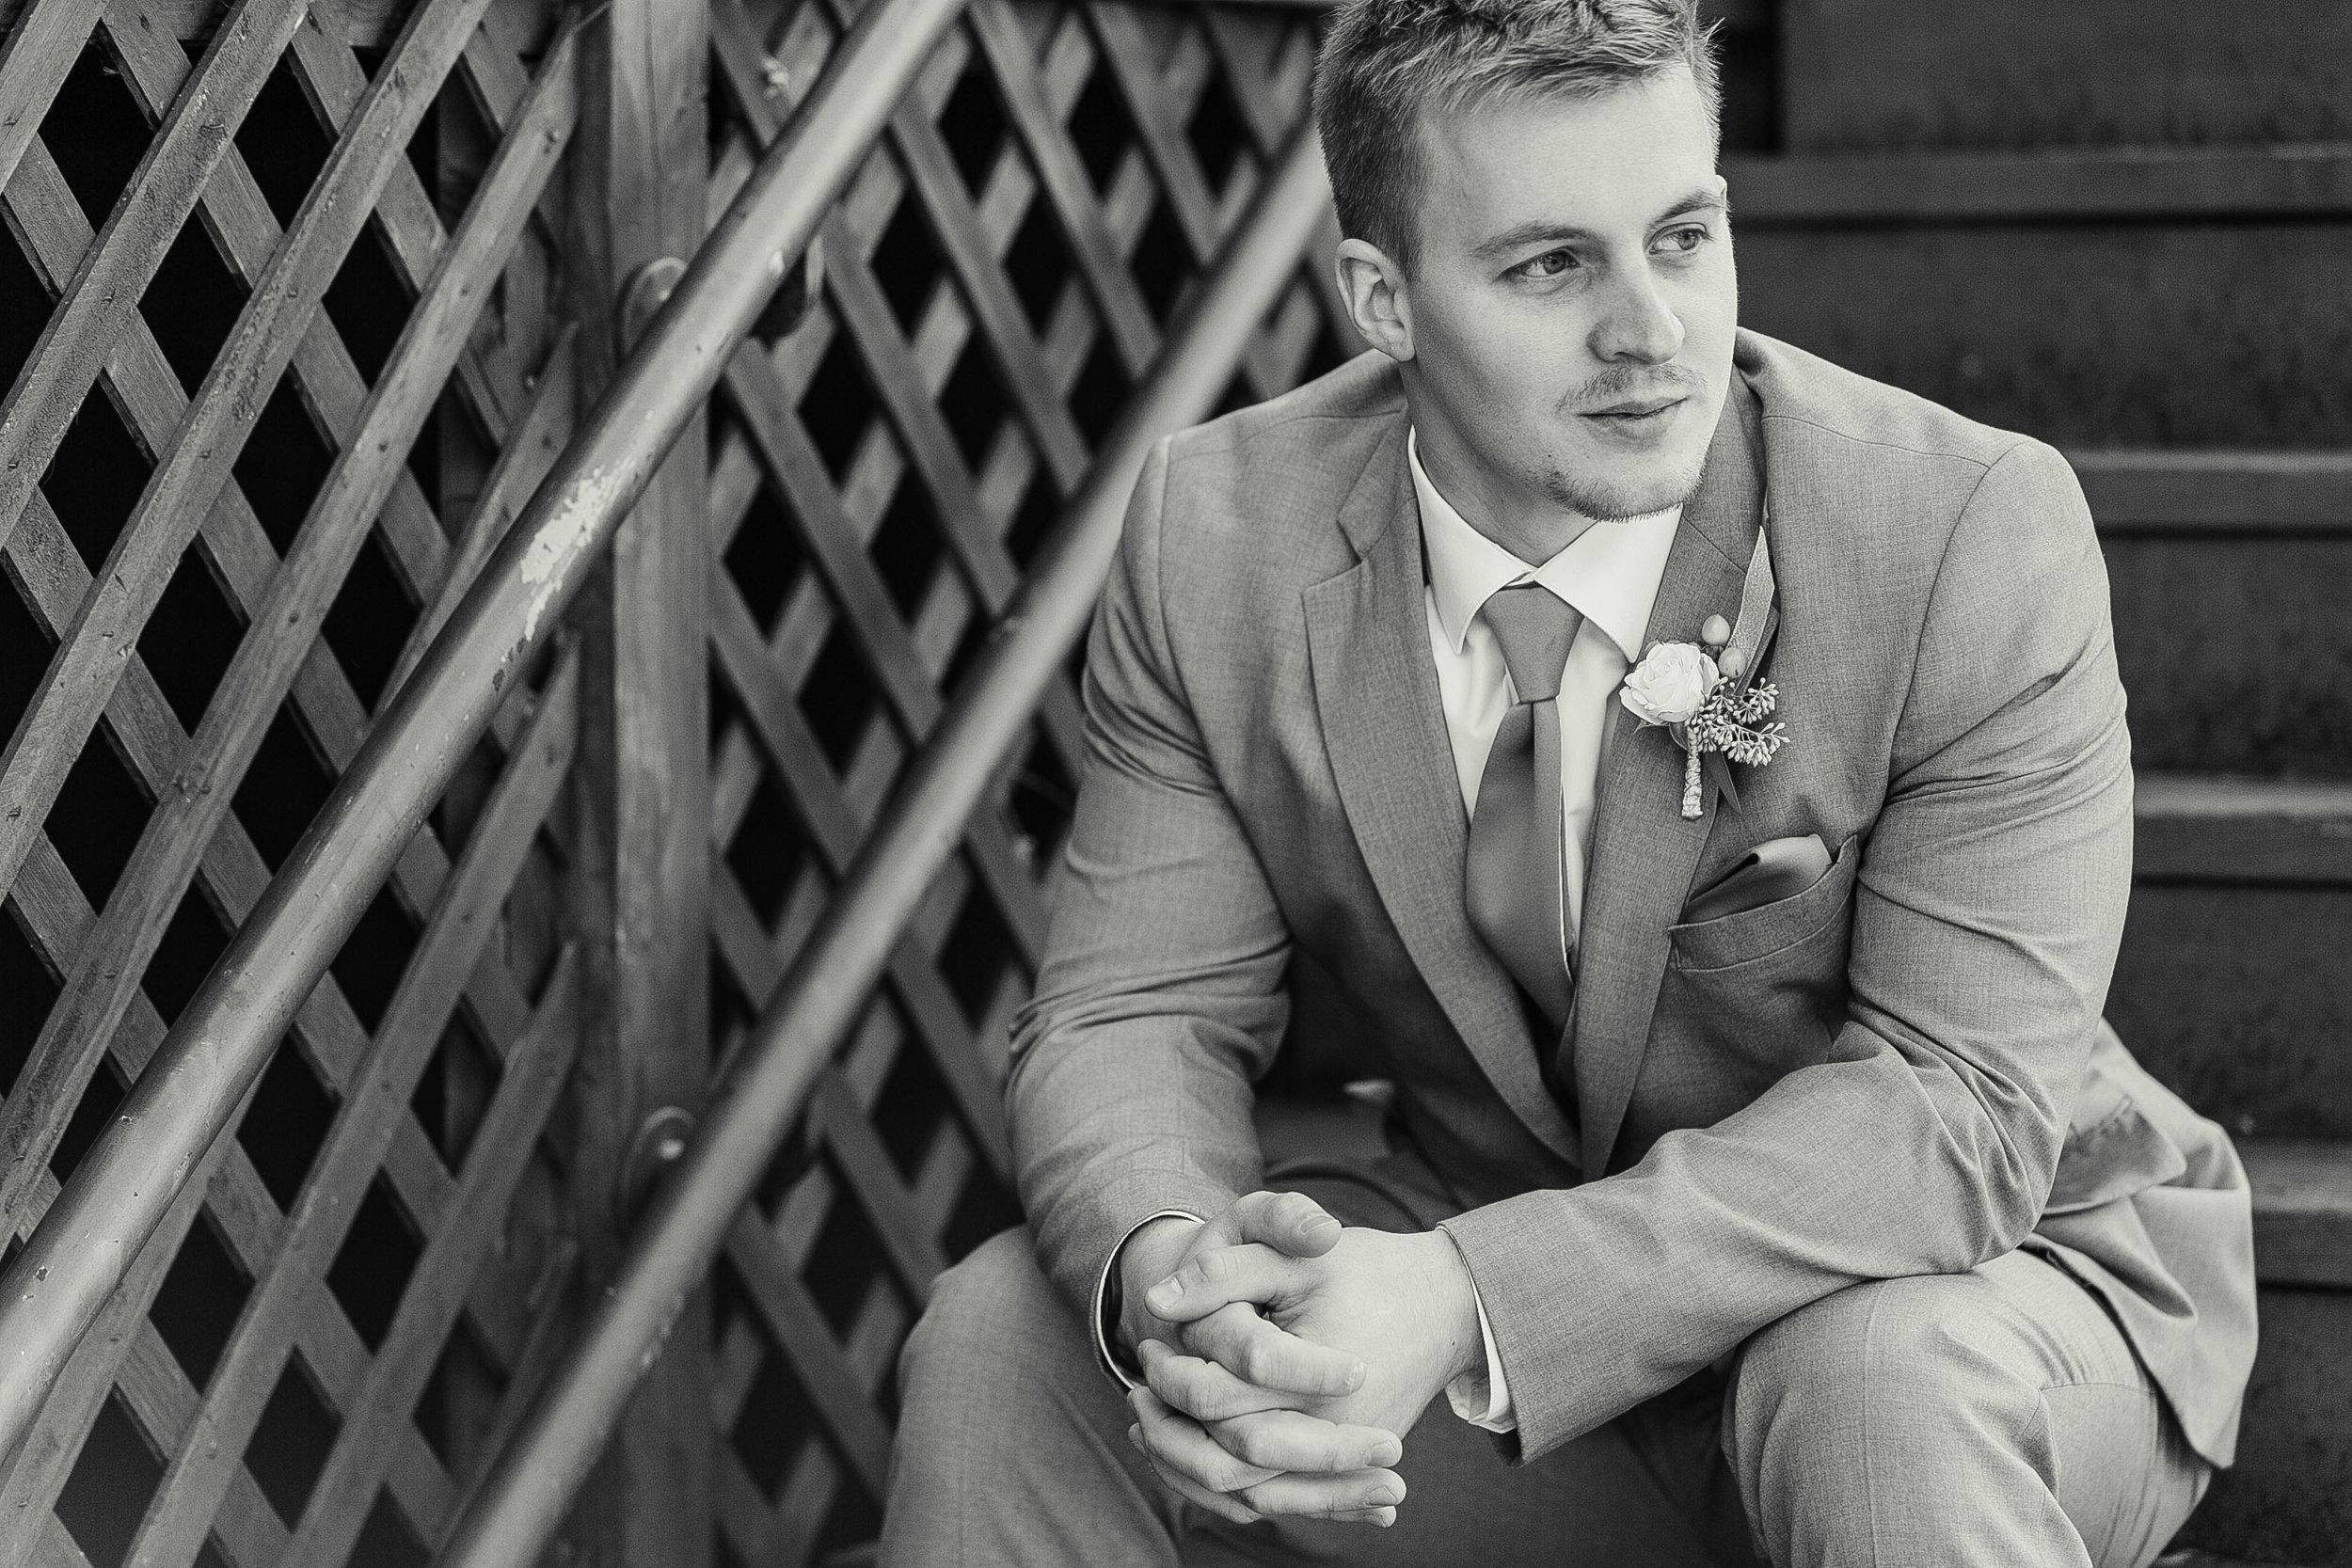 groom posing on stairs outdoors